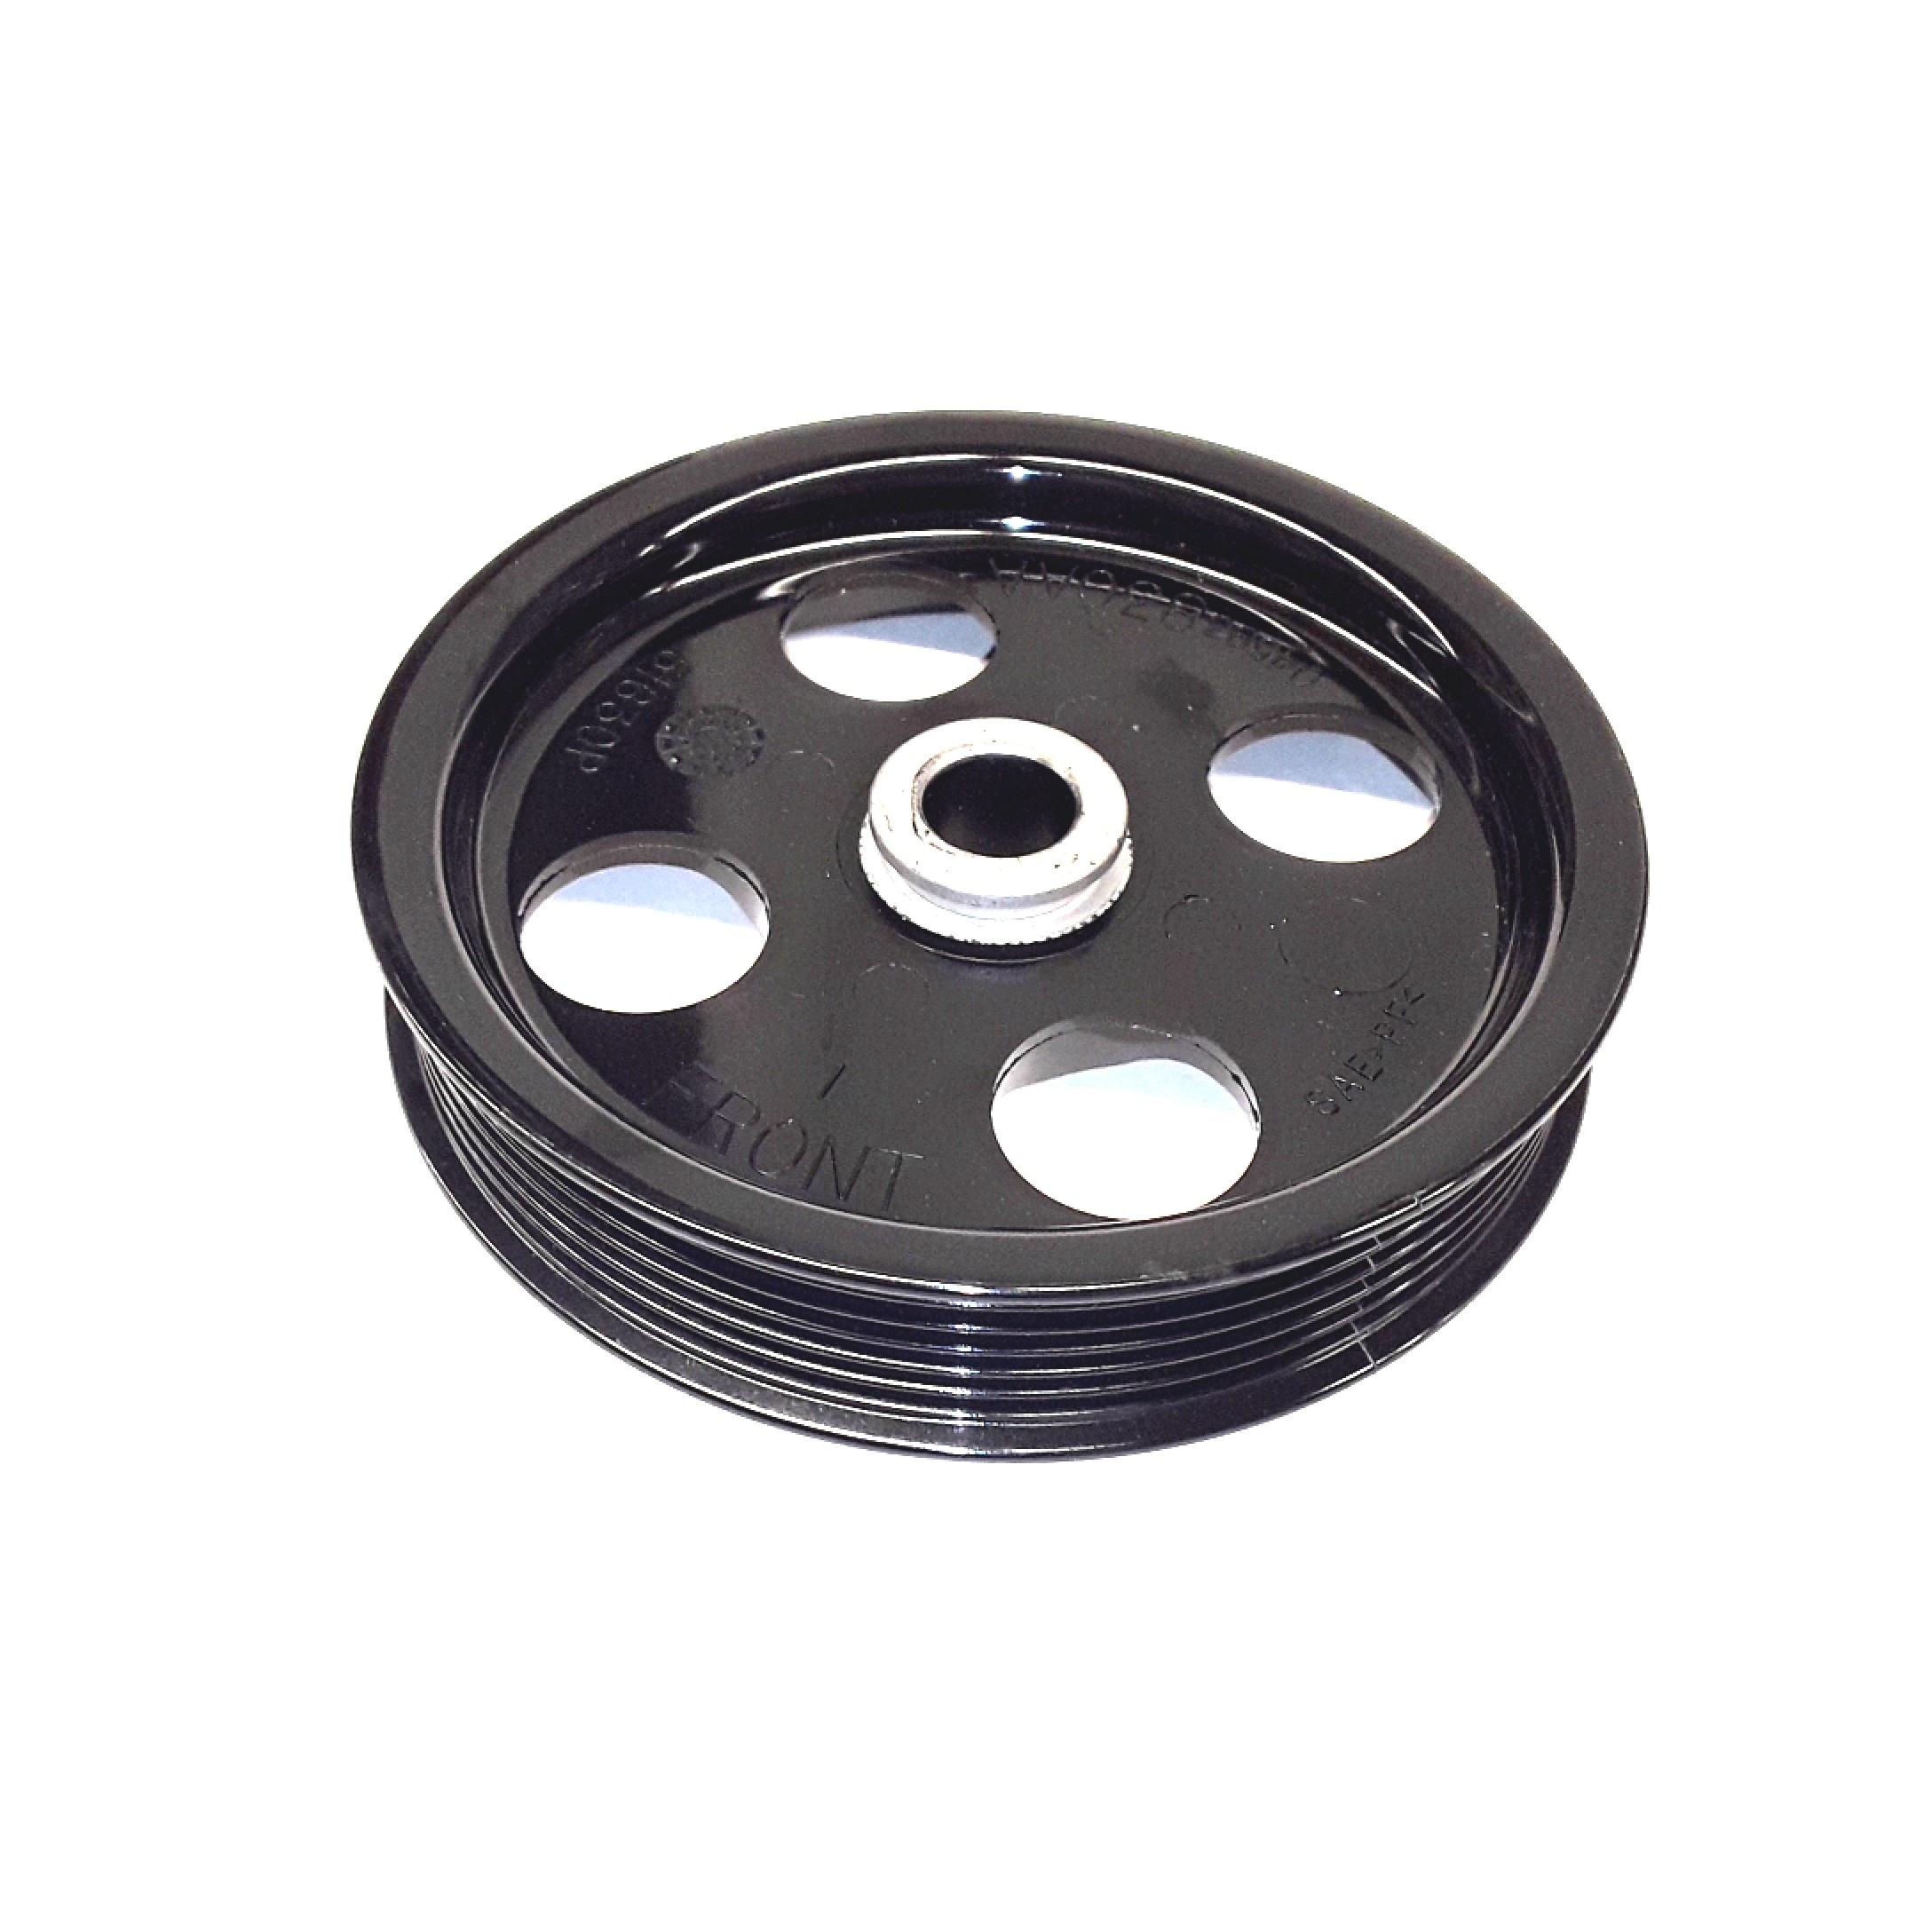 7b0145255 Volkswagen P S Pulley Power Steering Pump